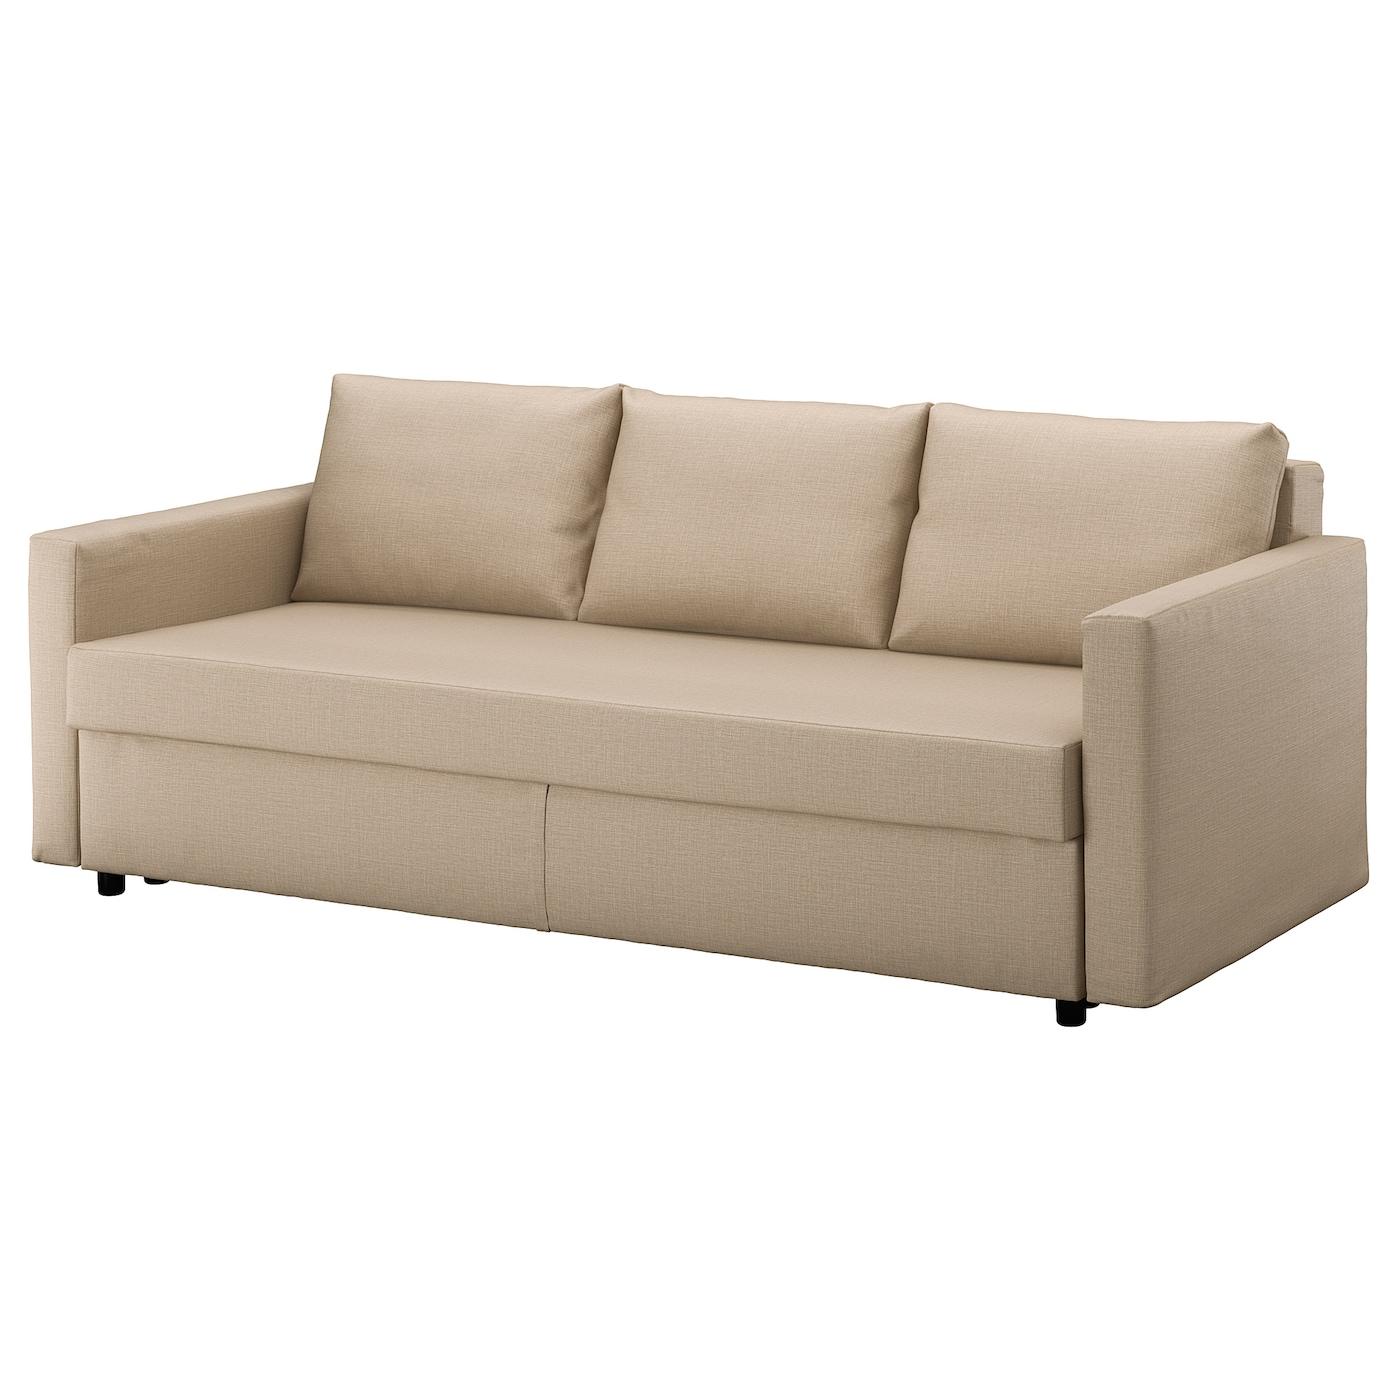 Ikea Friheten Sofá Cama 3 Plazas Se Convierte Fácilmente En